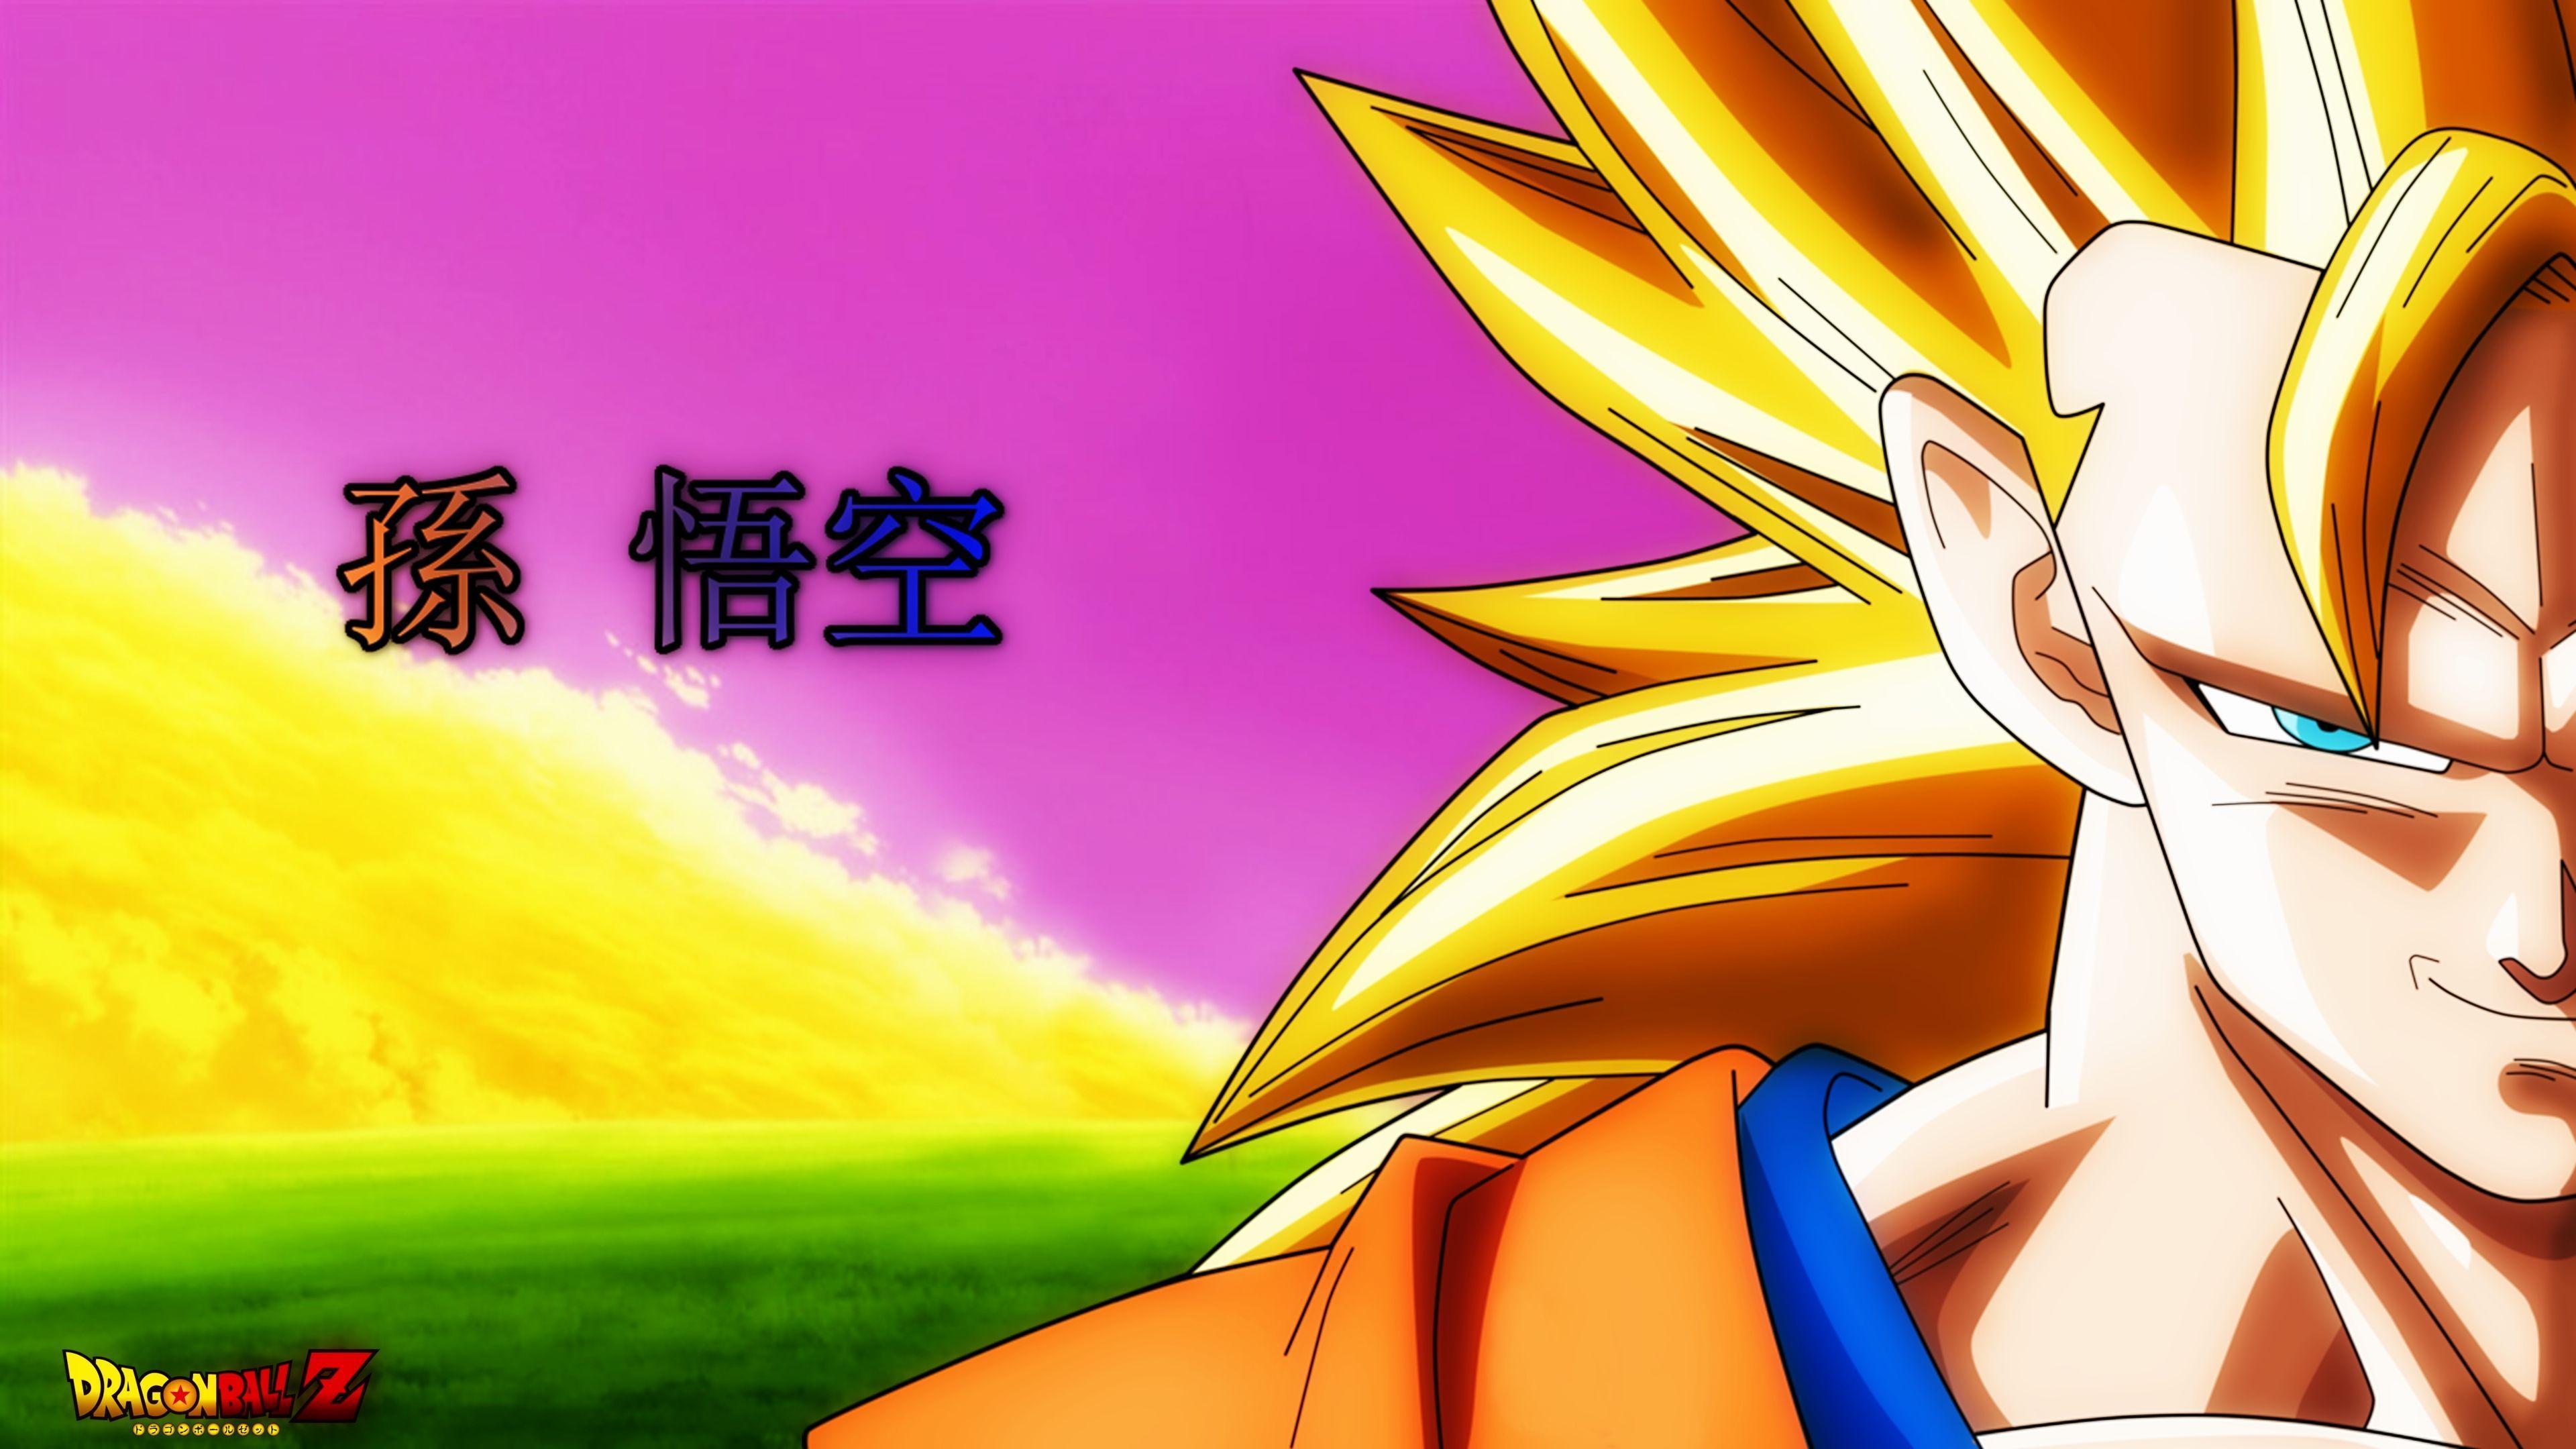 Son Goku De Dragon Ball Z Fondo De Pantalla Super Saiyan: Goku Super Saiyan 3 Wallpapers